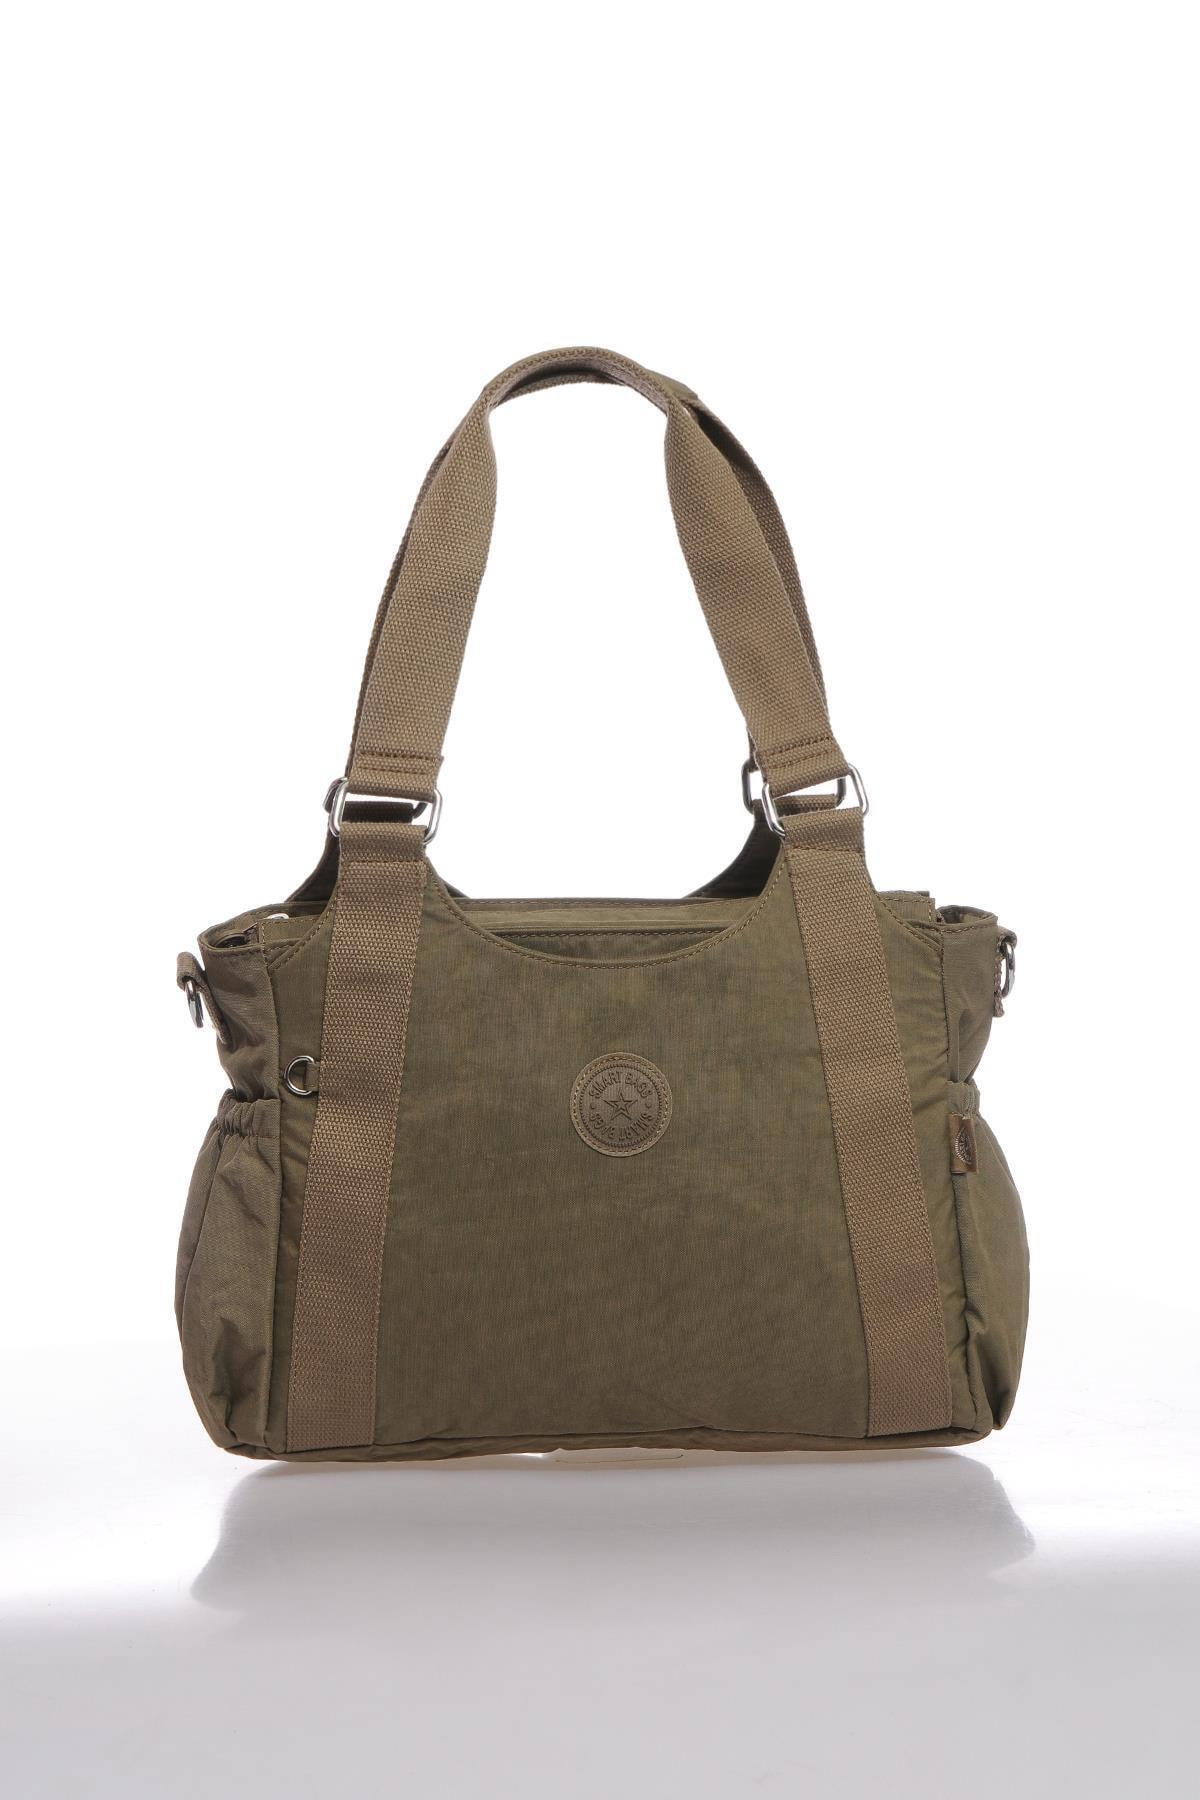 SMART BAGS Kadın  A.kahverengi  Omuz Çantası Smbk1163-0007 1